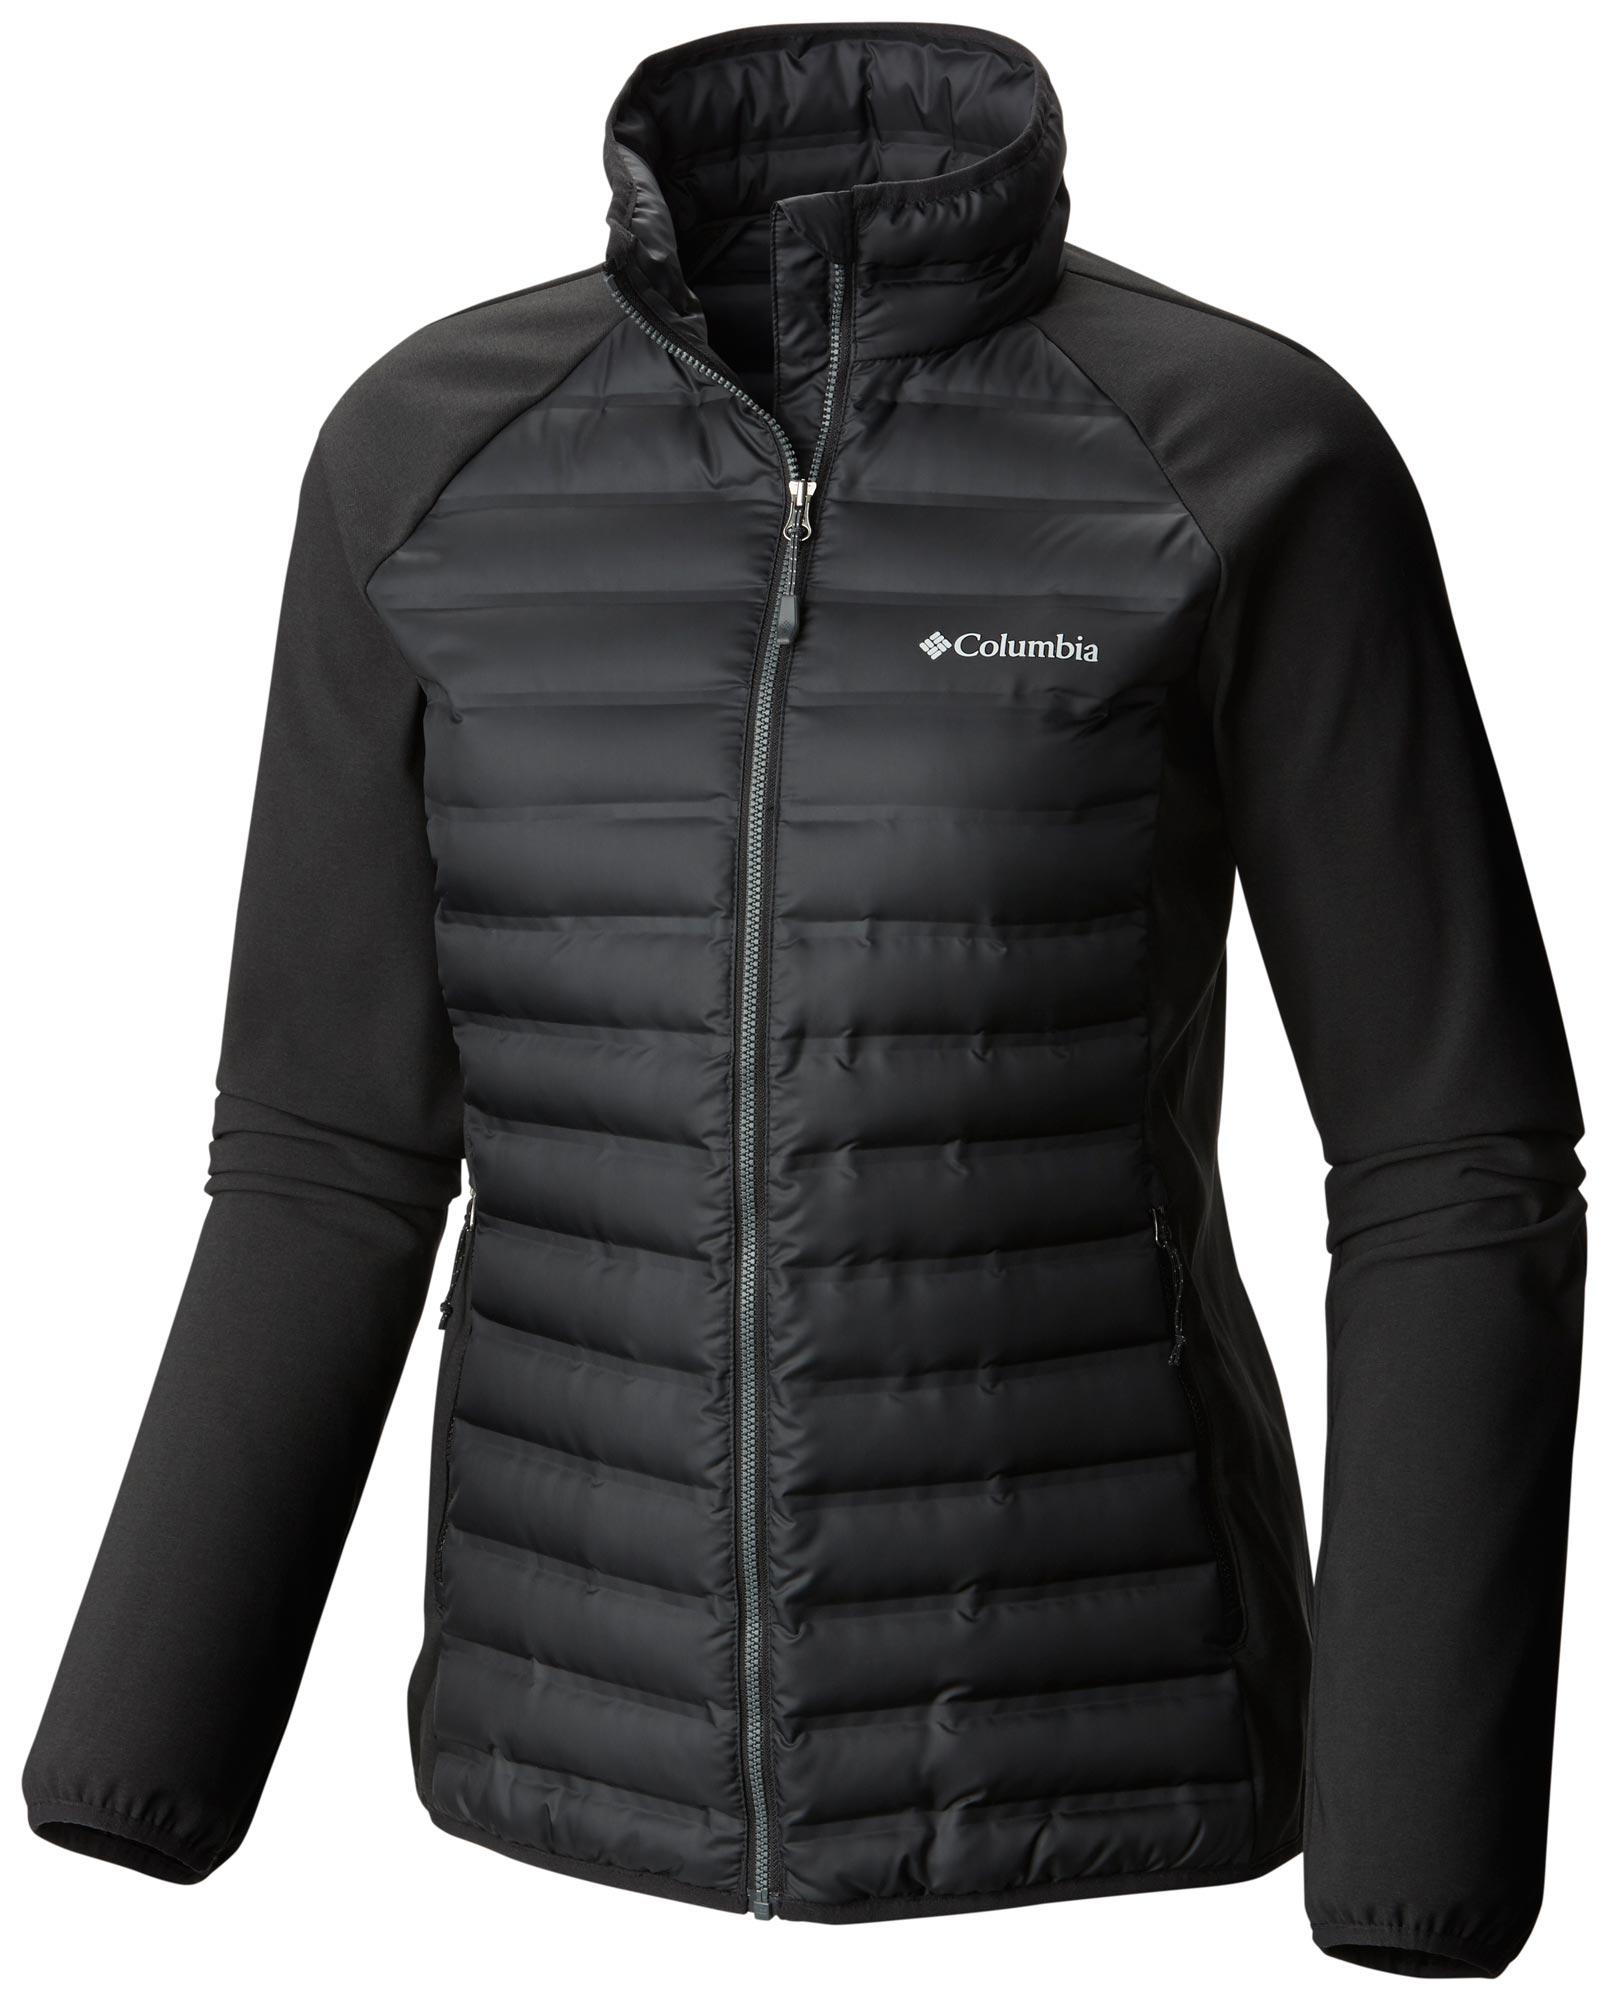 Columbia Hybrid Jacket